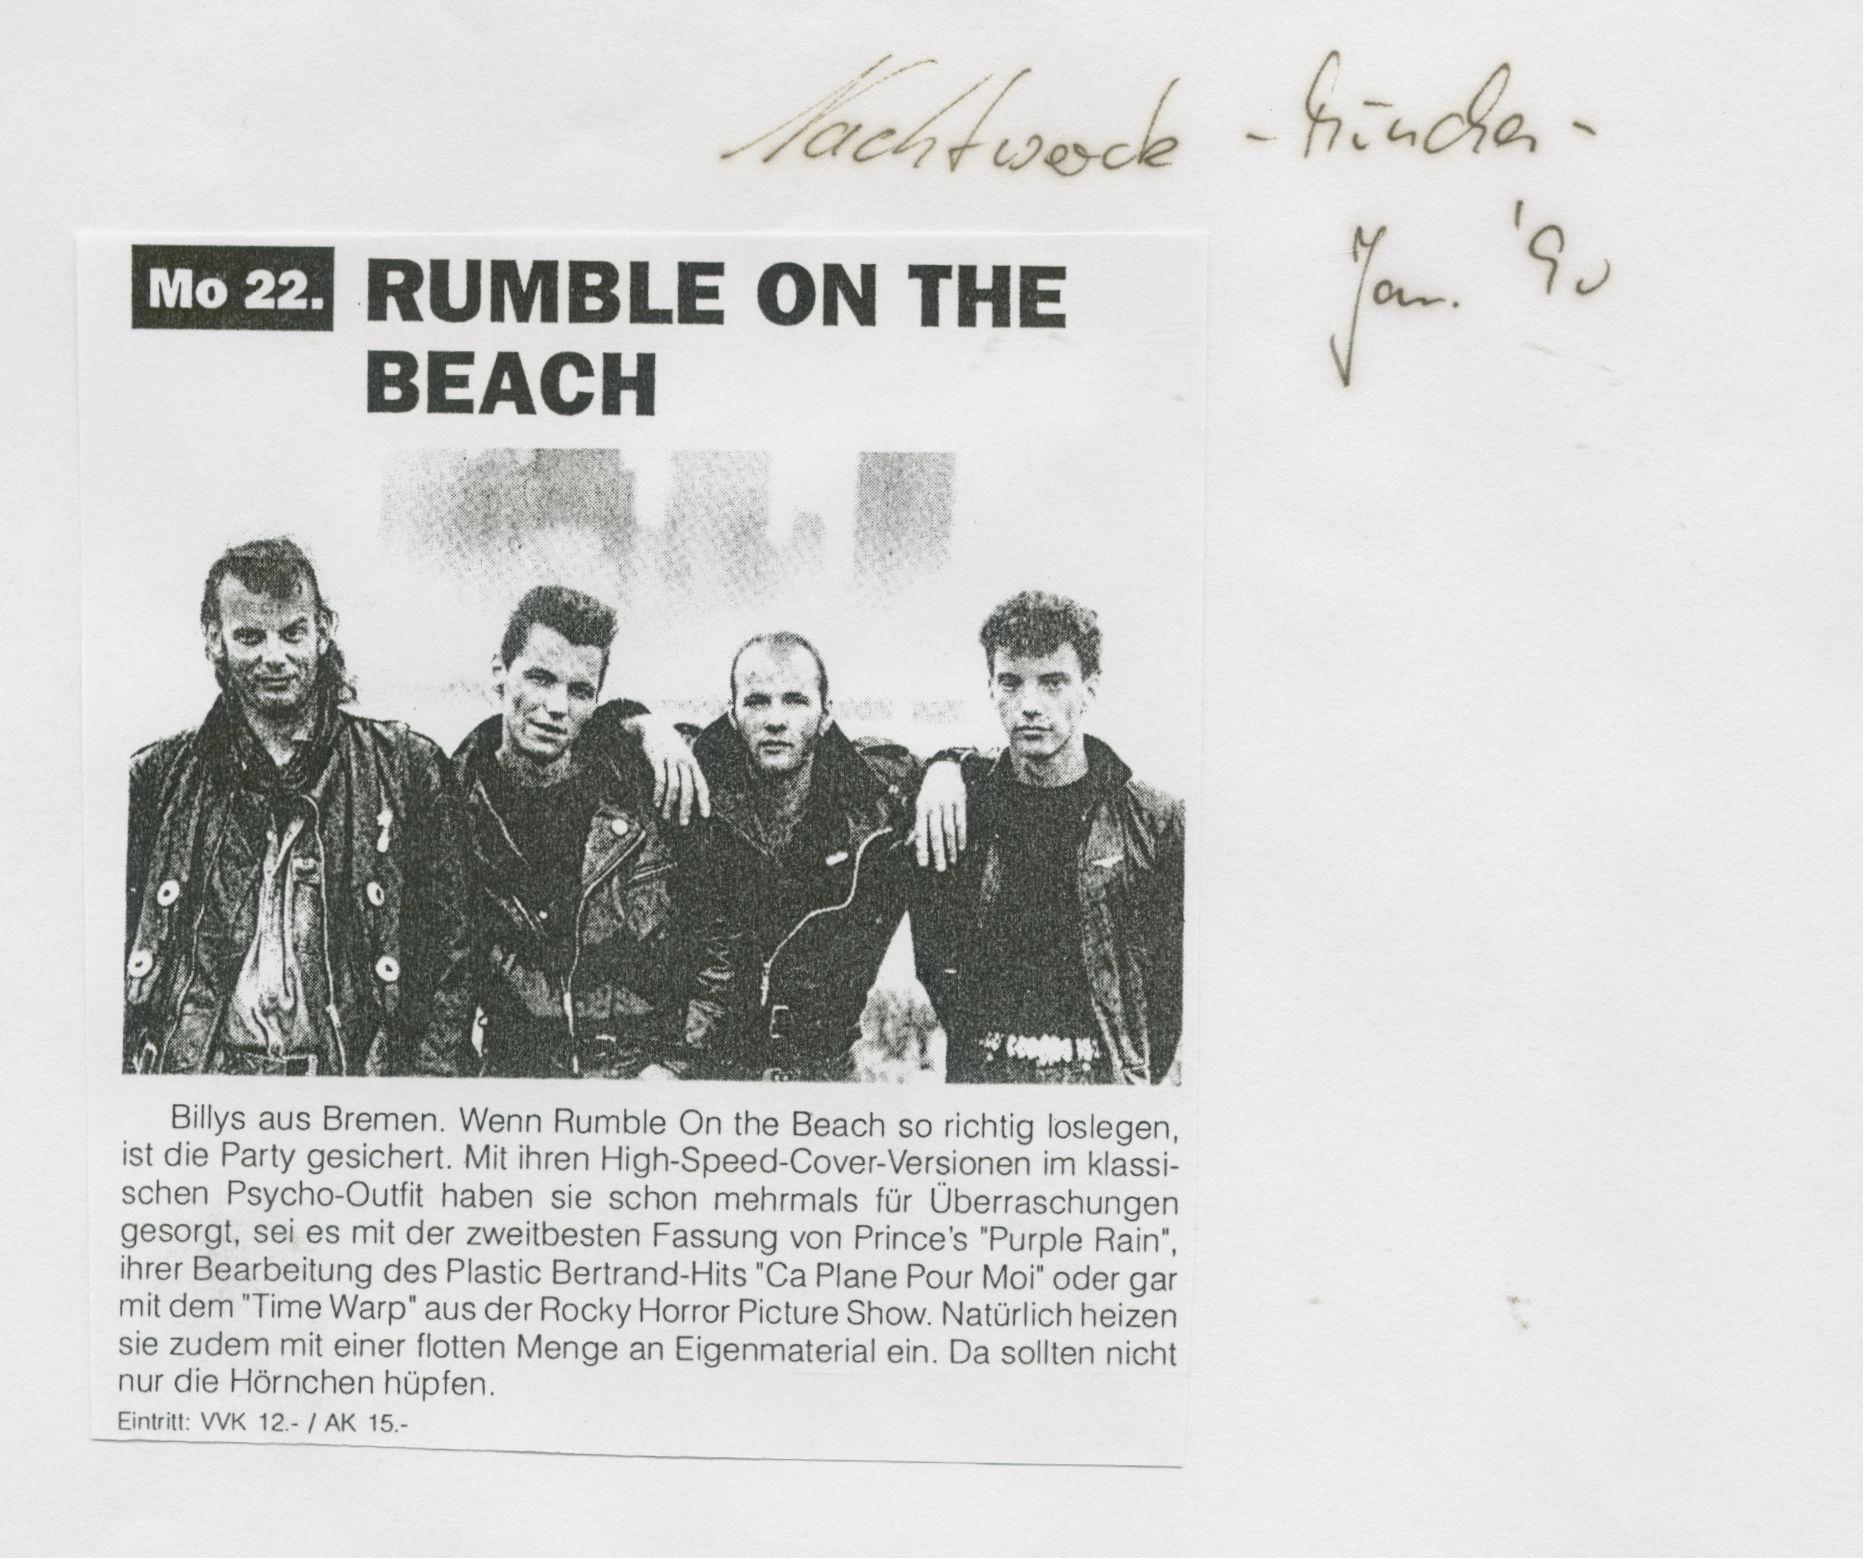 Rumble on the Beach Nachtwache München Januar 1990